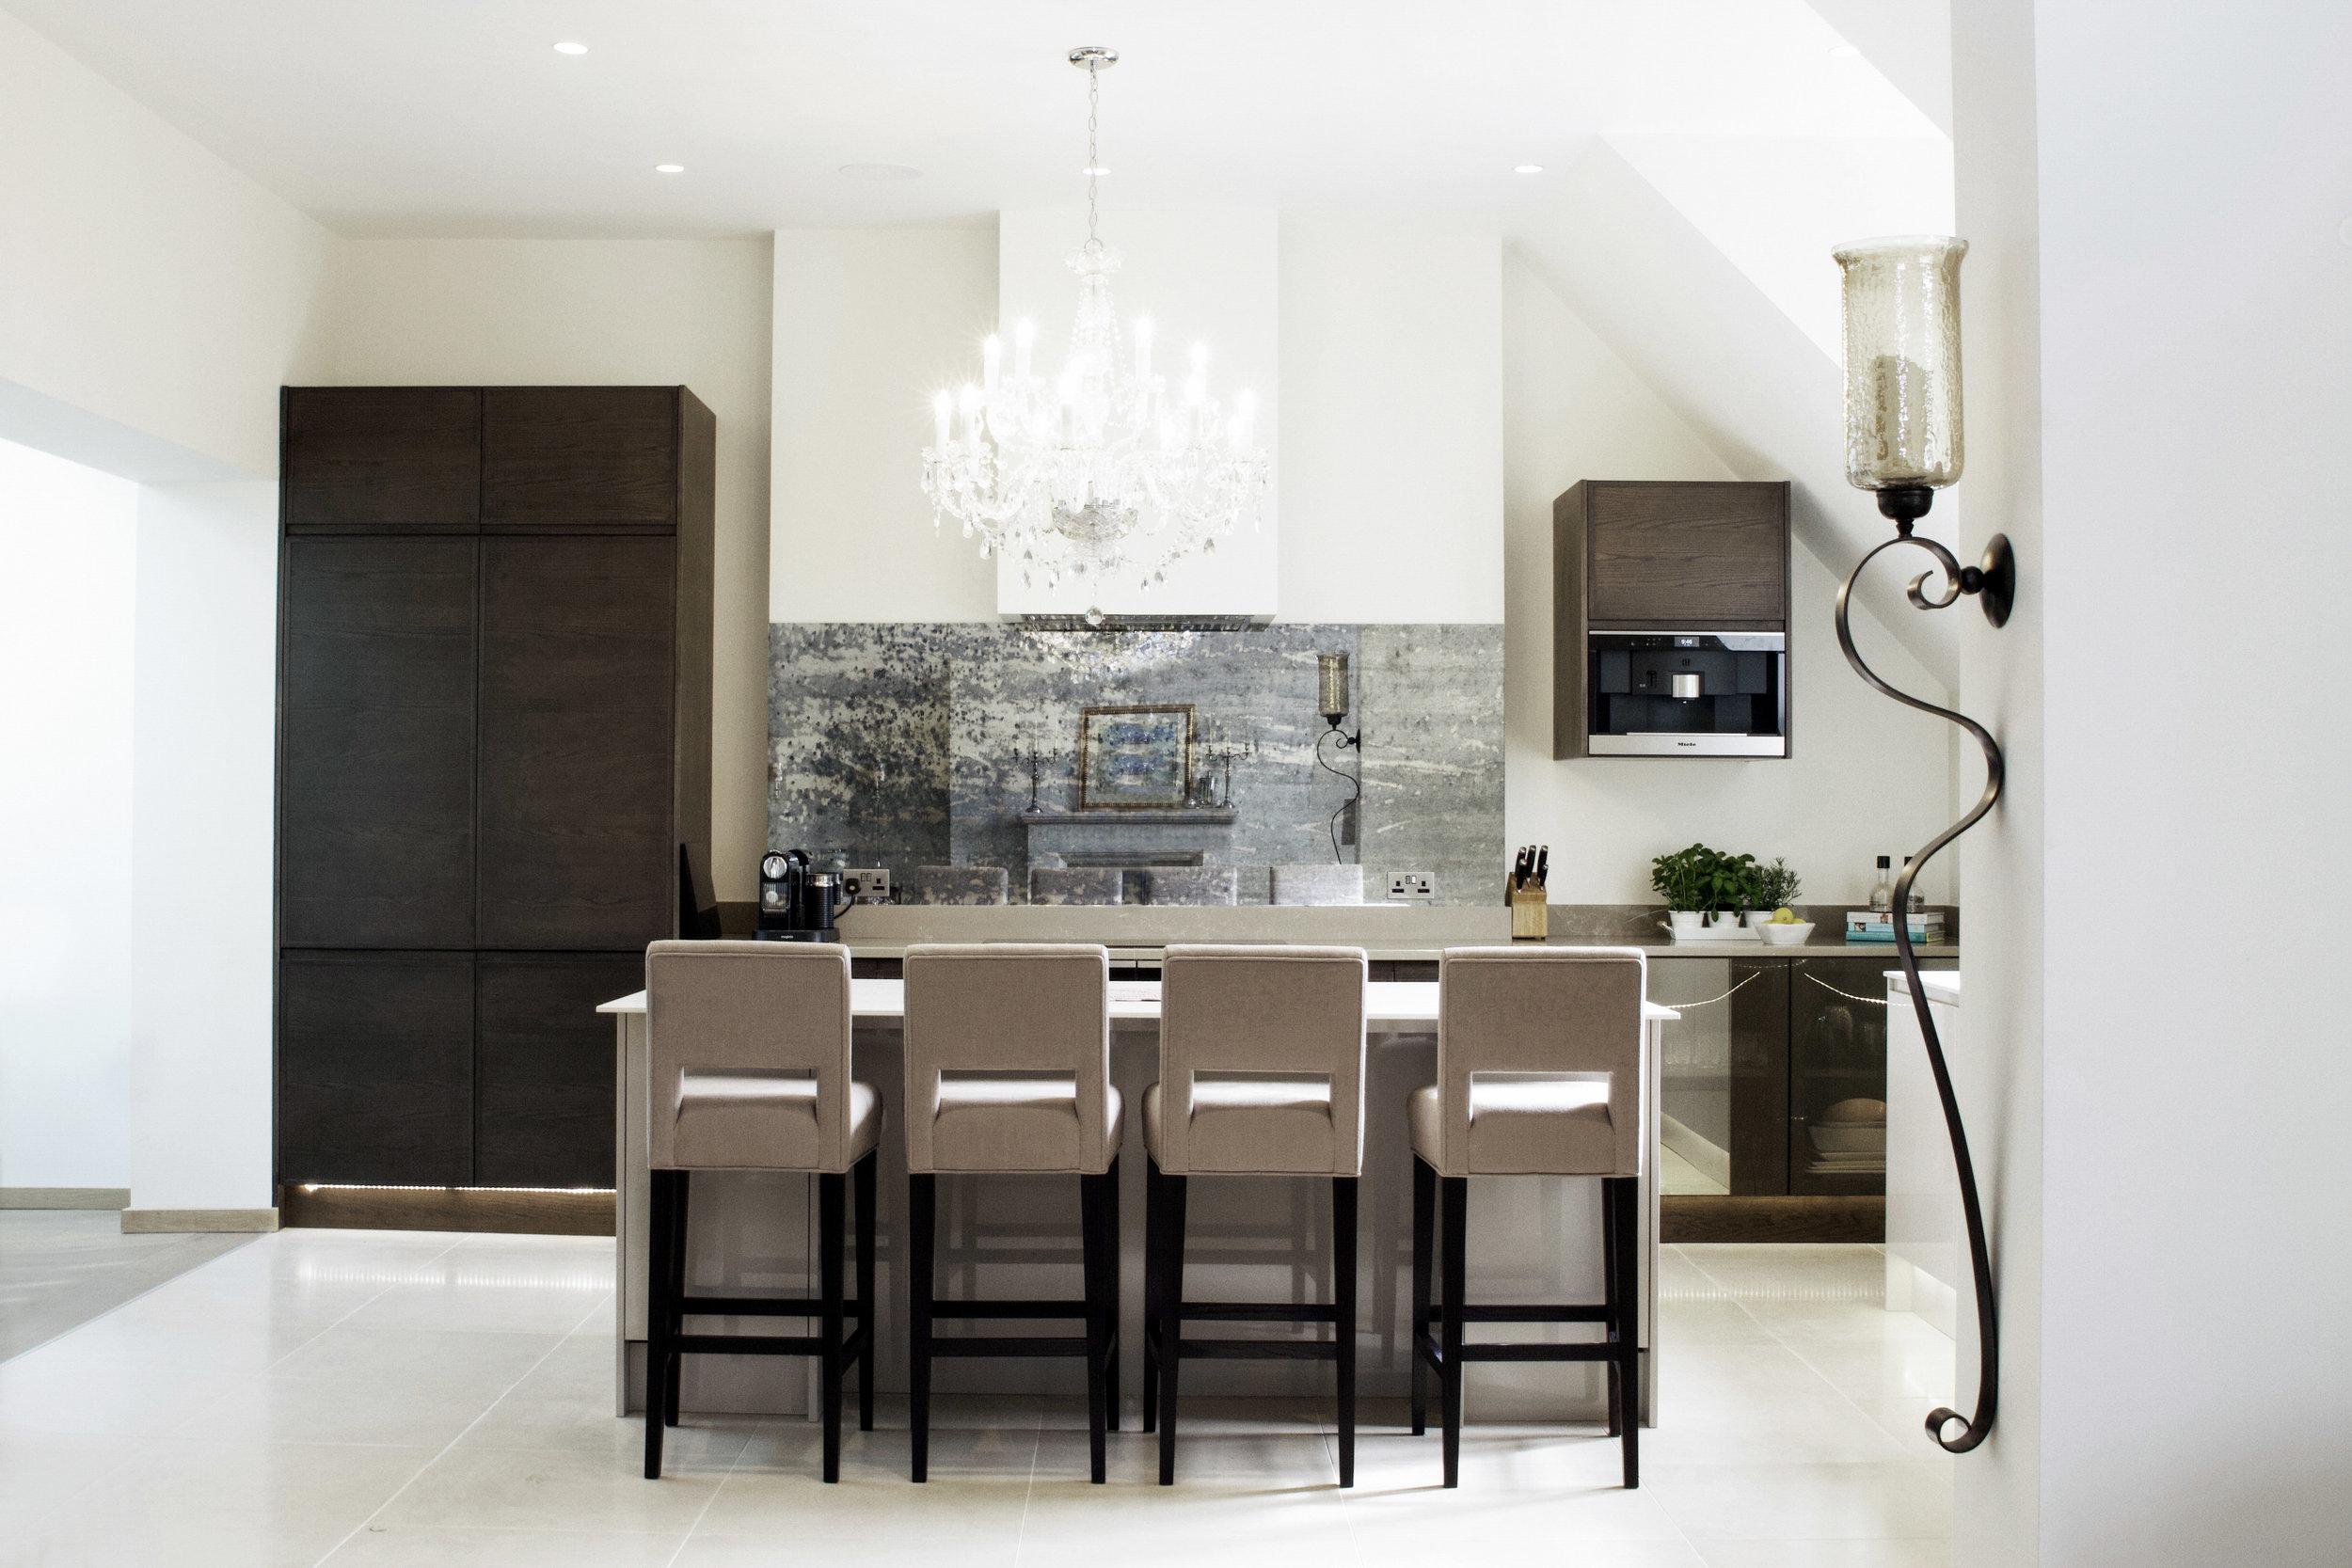 Converted Apartments, Harrogate